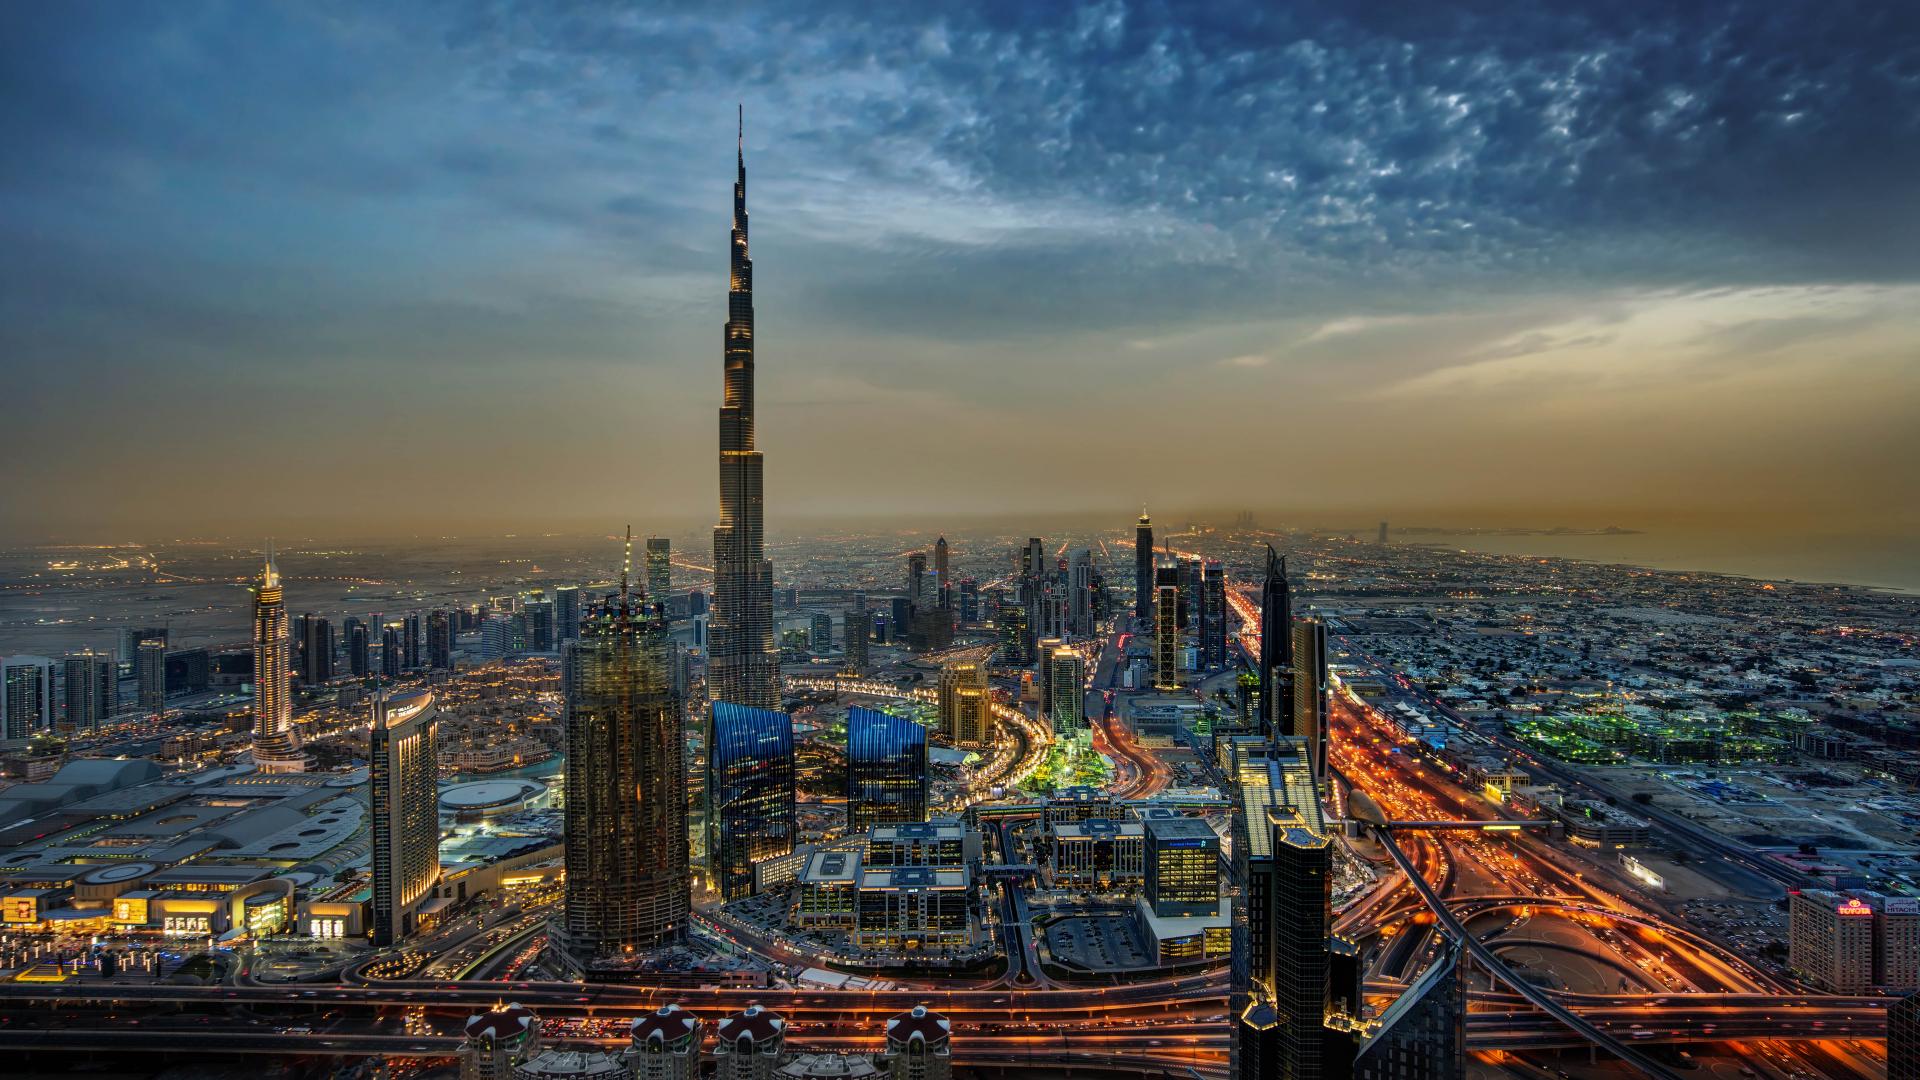 Burj Khalifa Hd Photos: Download 1920x1080 Wallpaper Burj Khalifa, Dubai, City